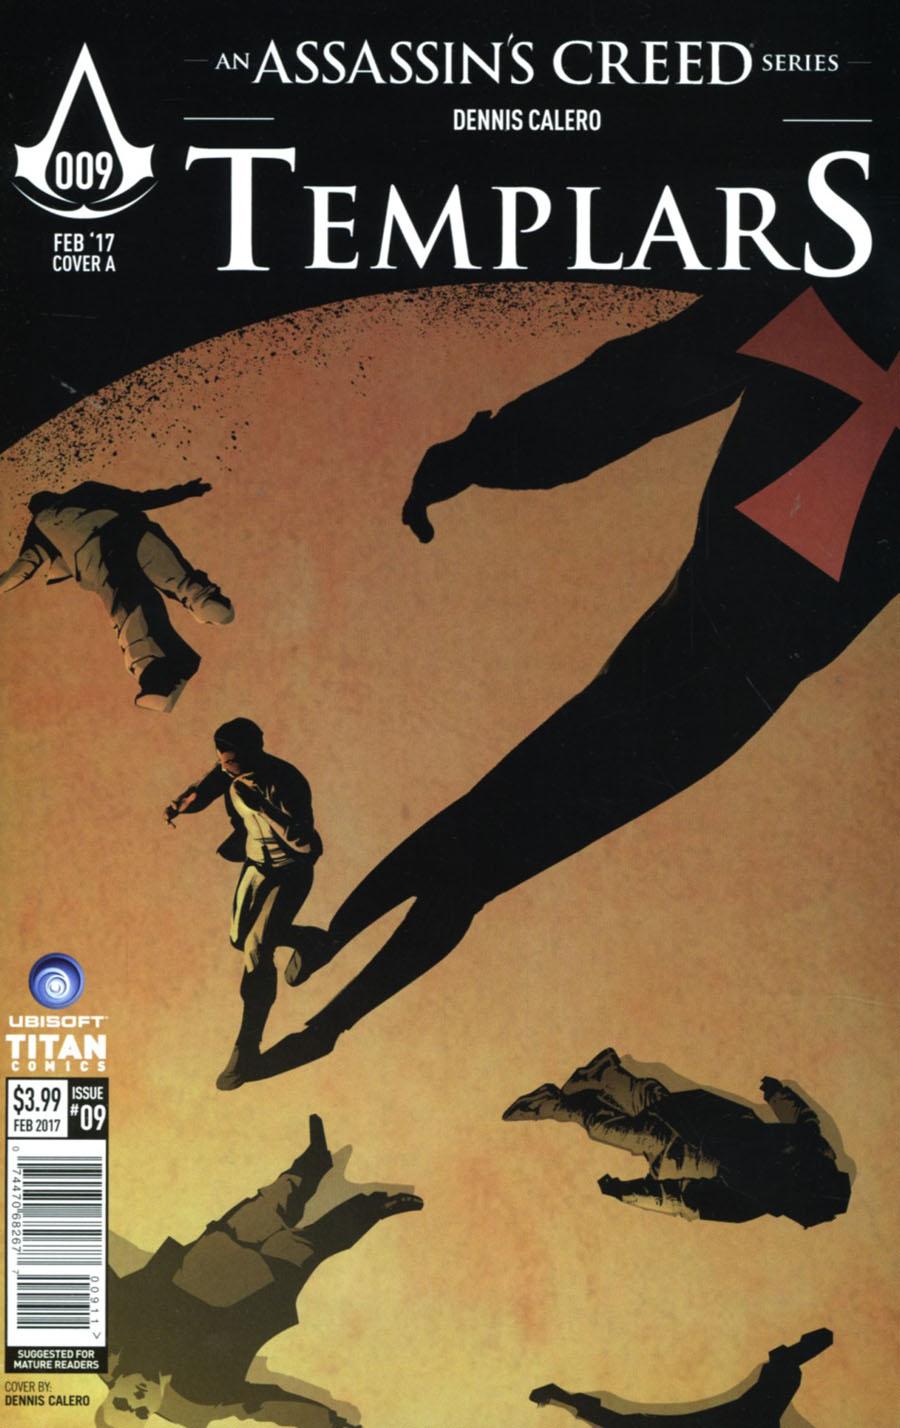 Assassins Creed Templars #9 Cover A Regular Dennis Calero Cover